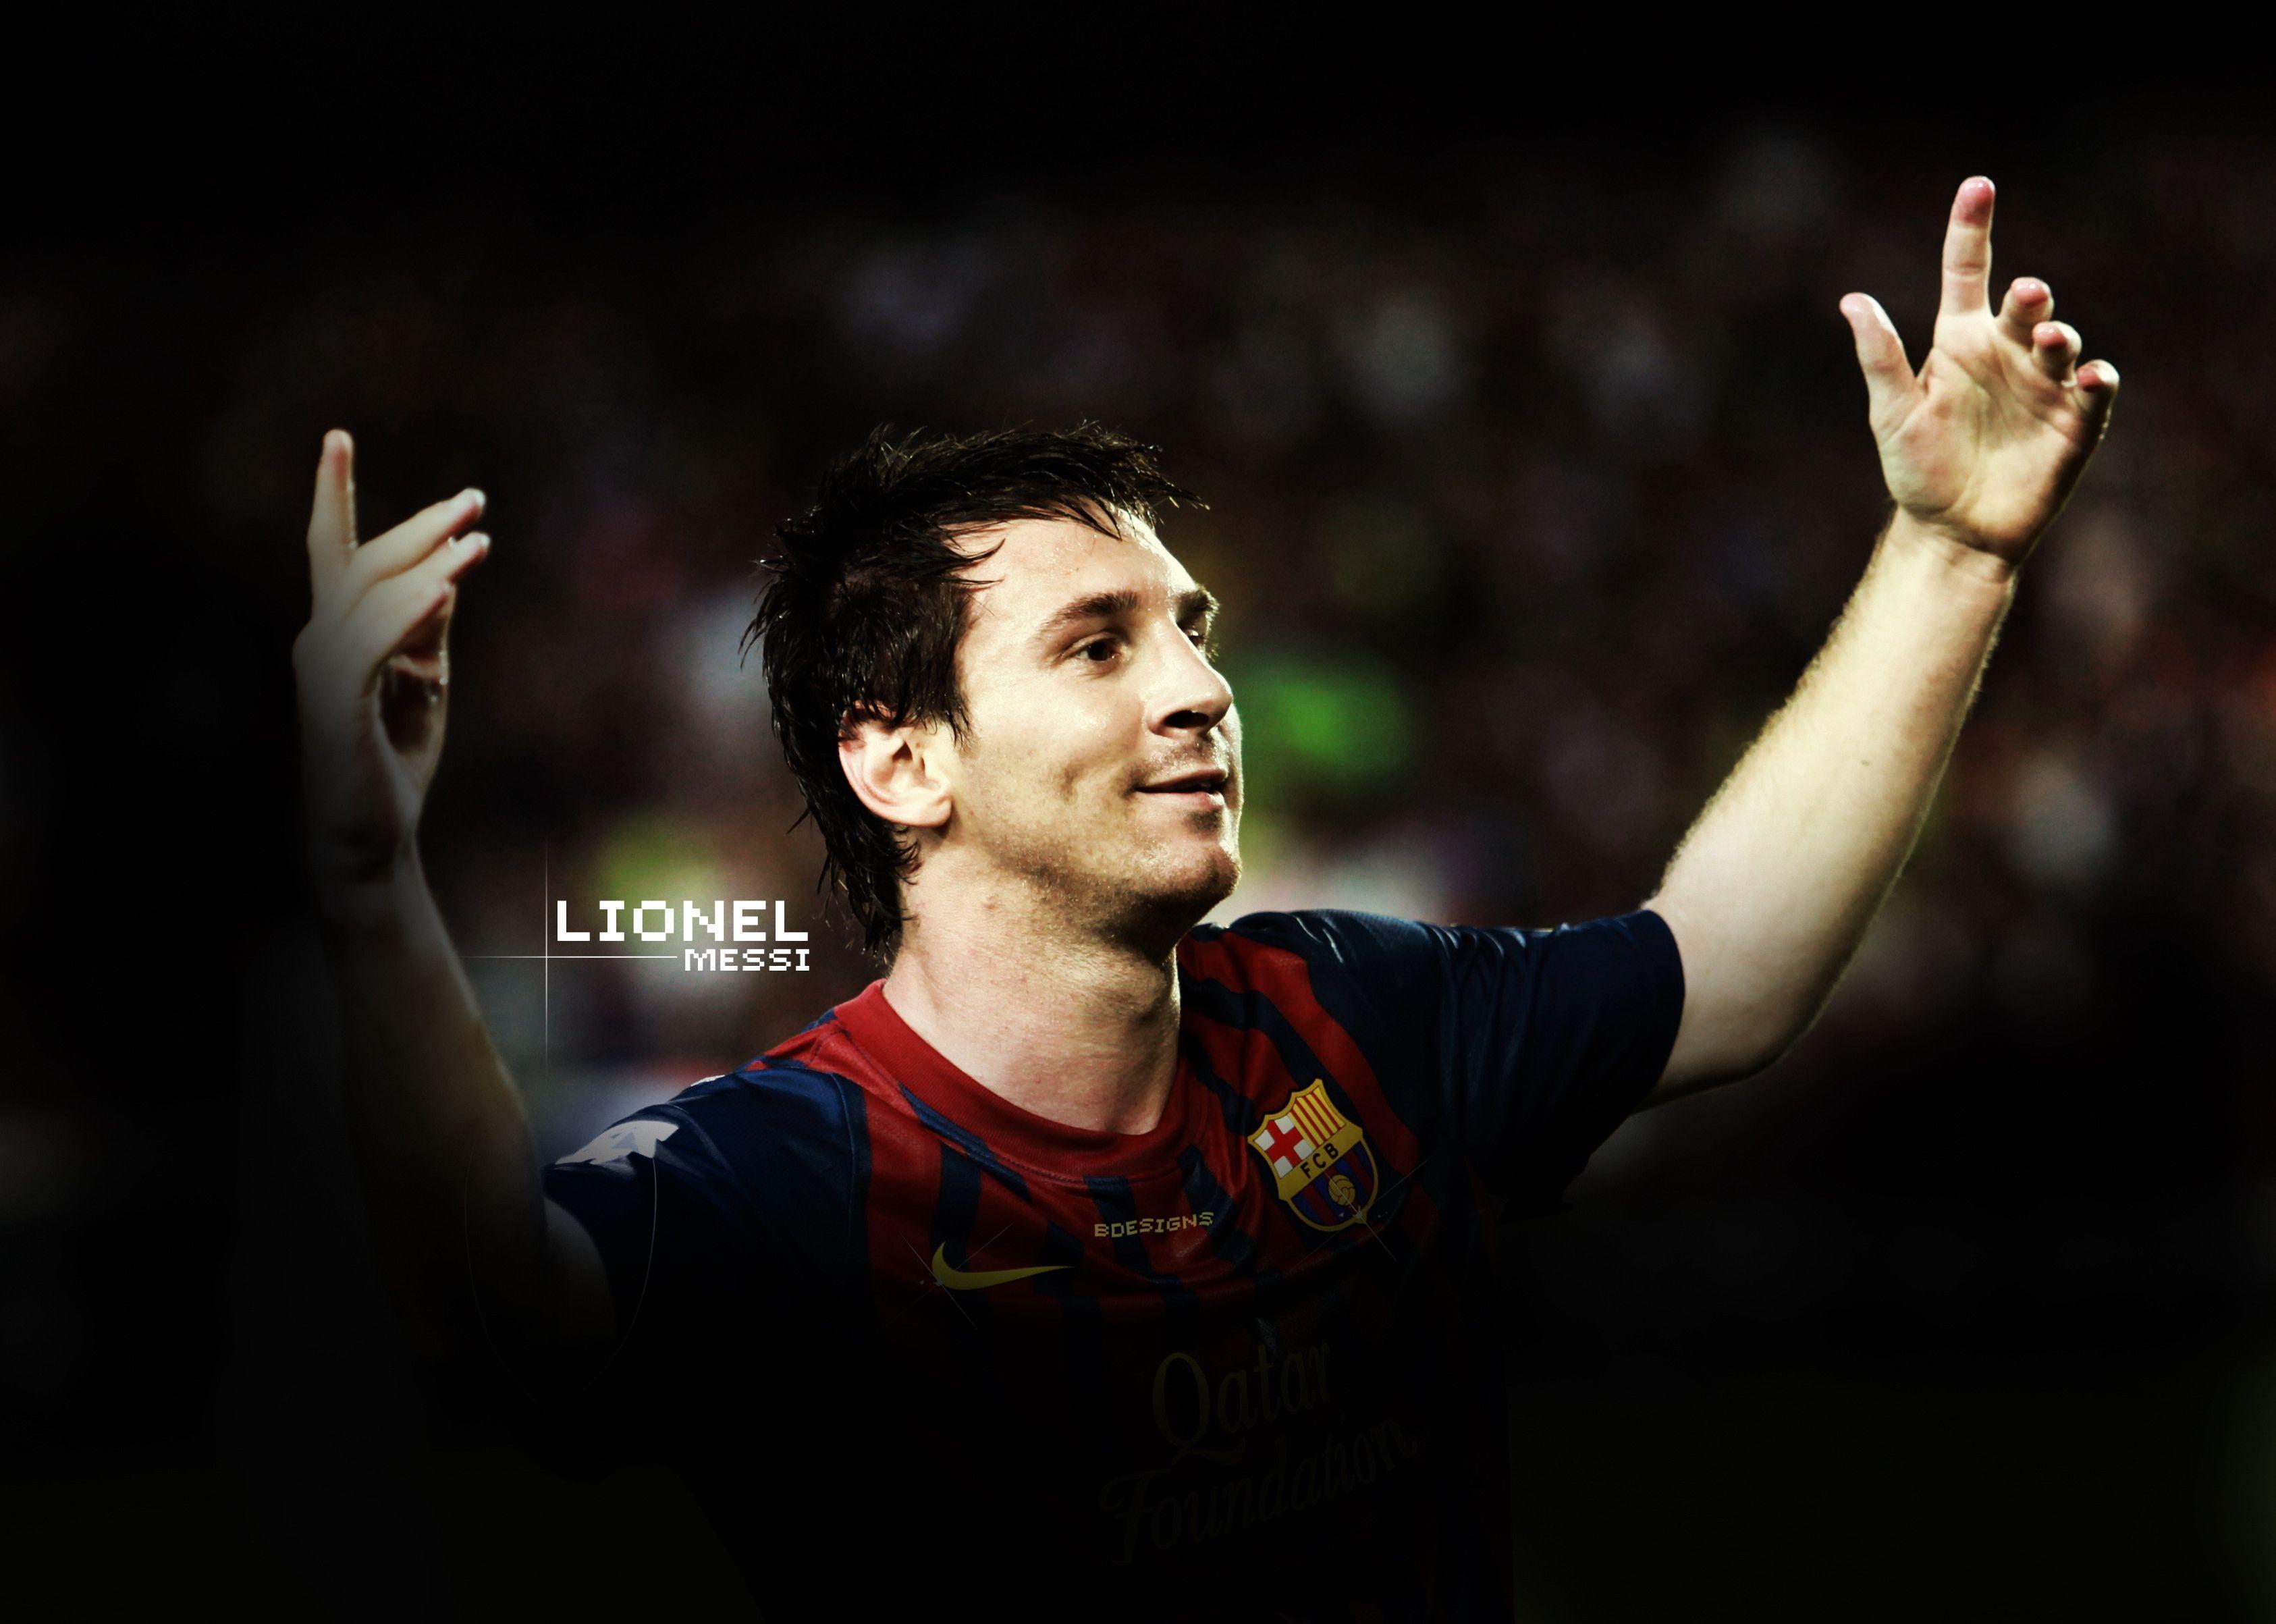 Lionel Messi Wallpaper | Black HD Wallpapers